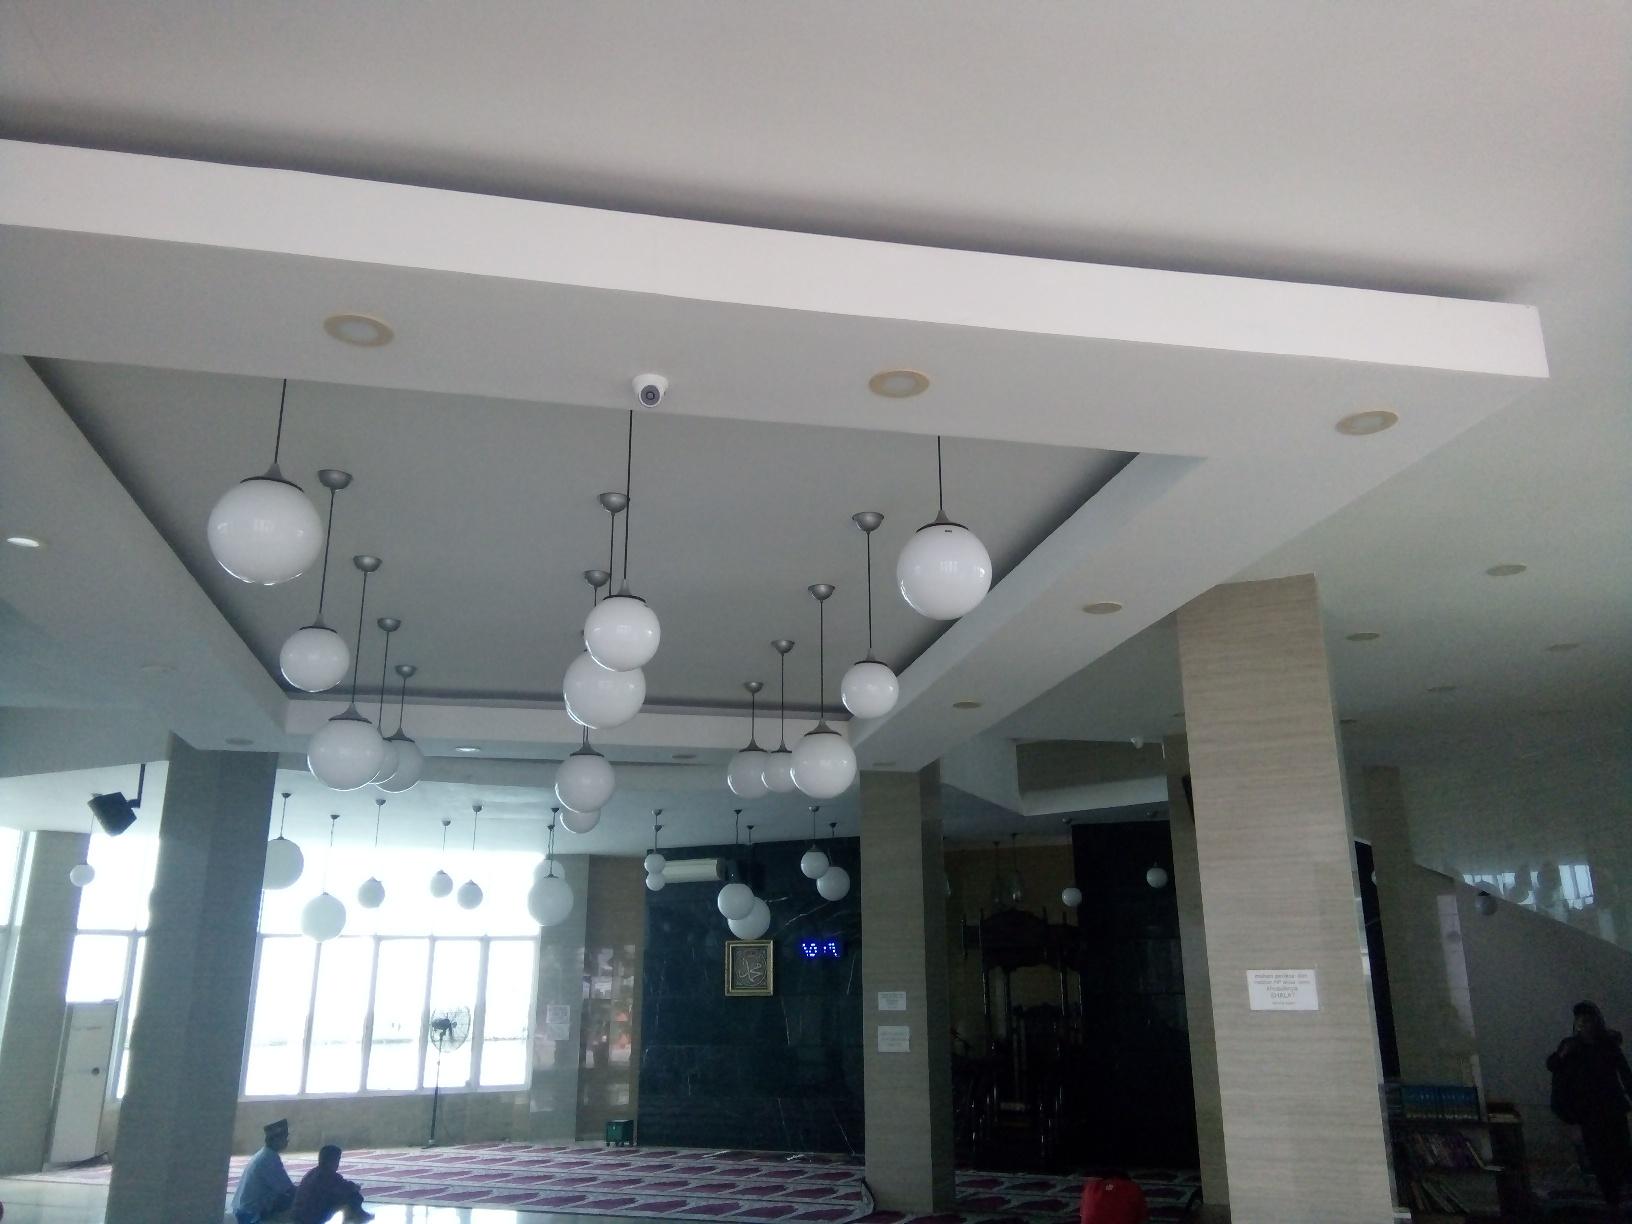 Berwisata Religi Masjid Amirul Mukminin Kota Makassar